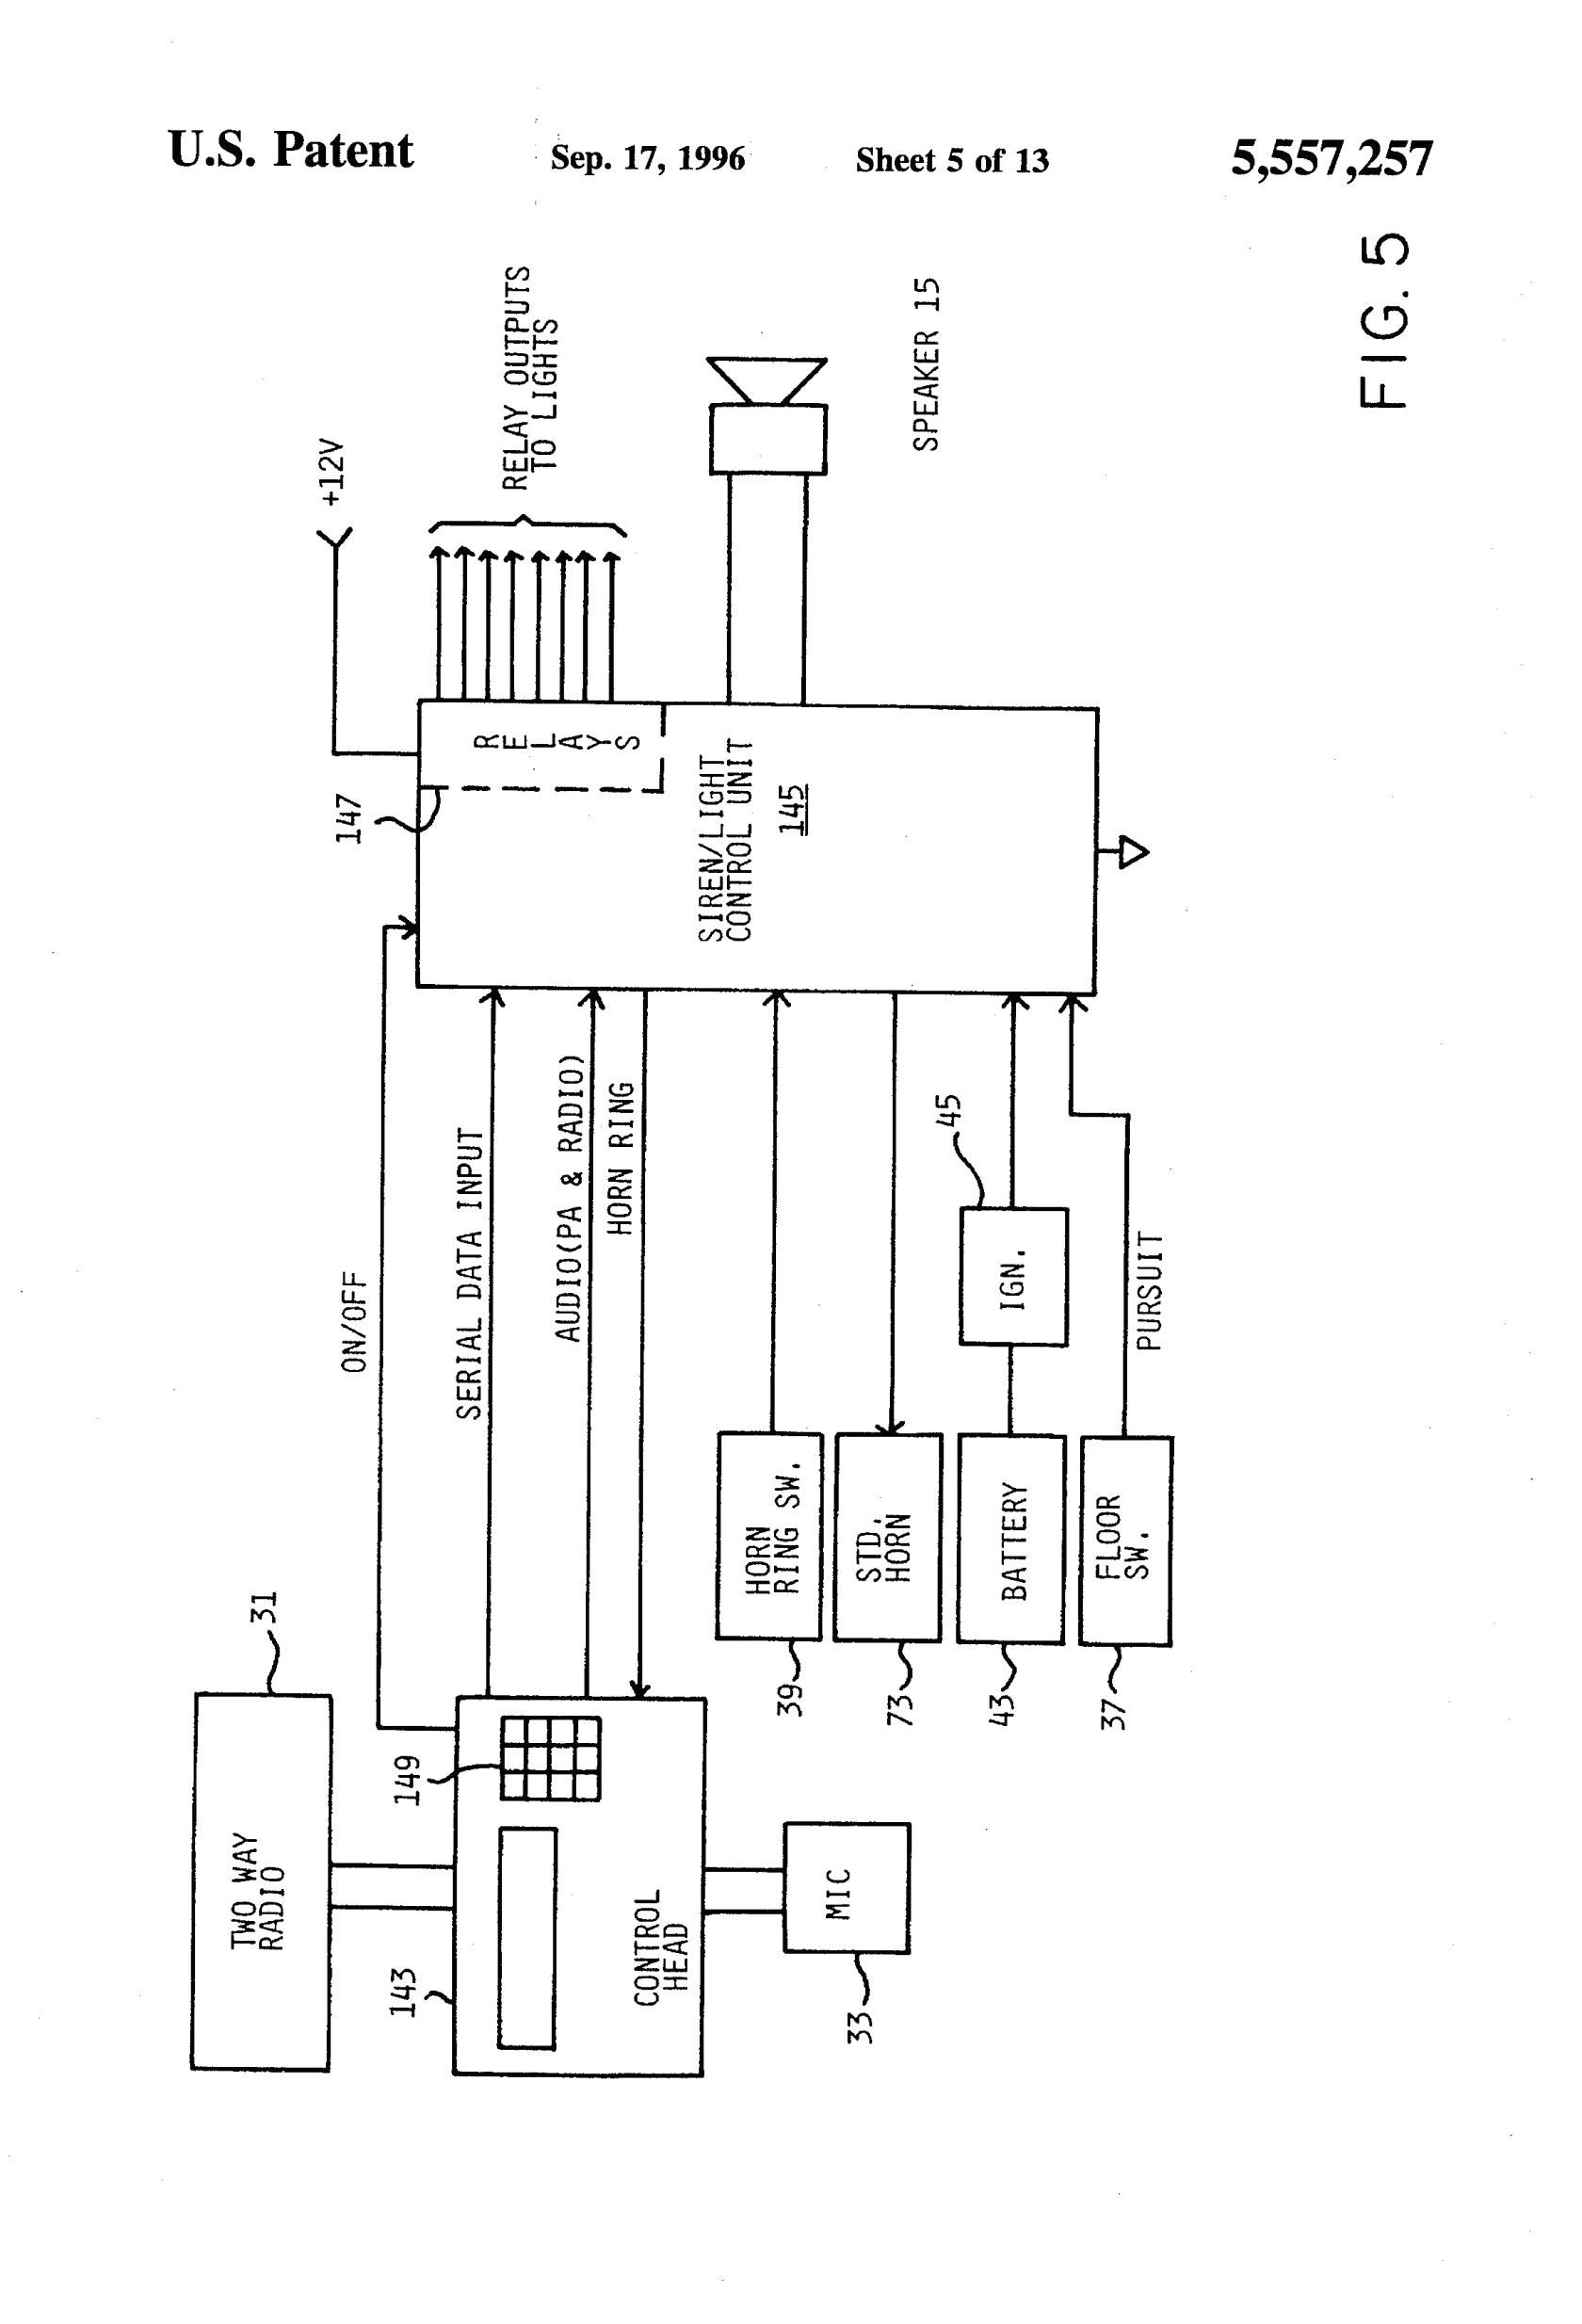 whelen siren wiring diagram book of switch power led strobe light at png